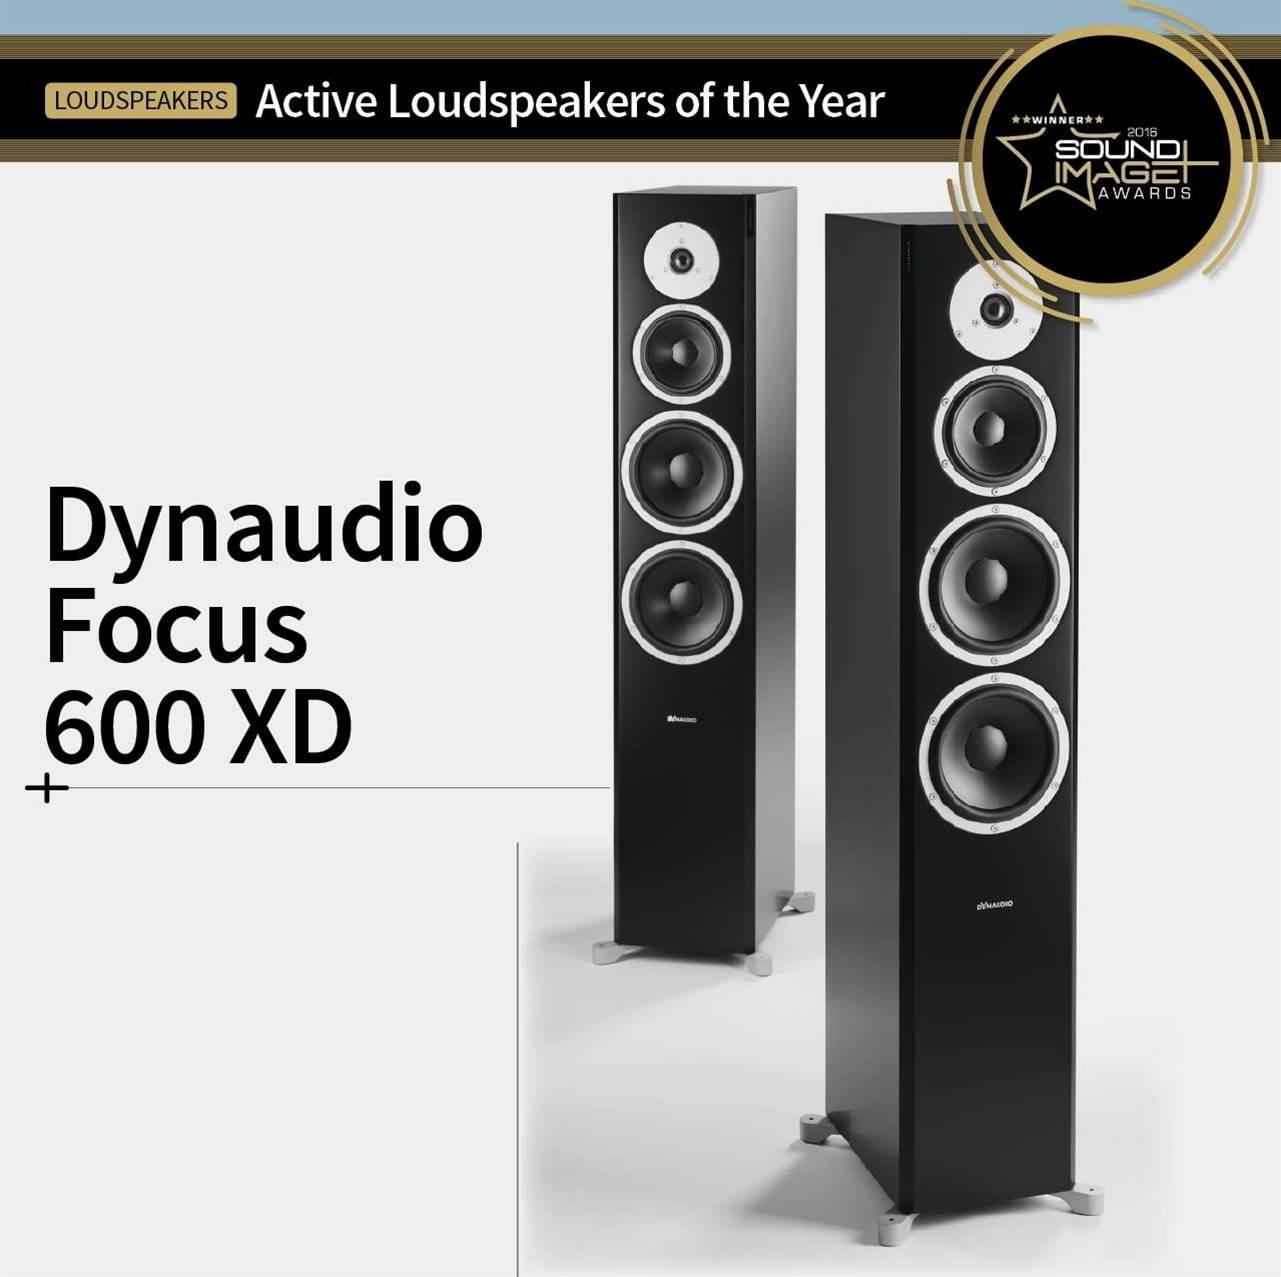 Dynaudio Focus 600XD active loudspeakers REVIEW